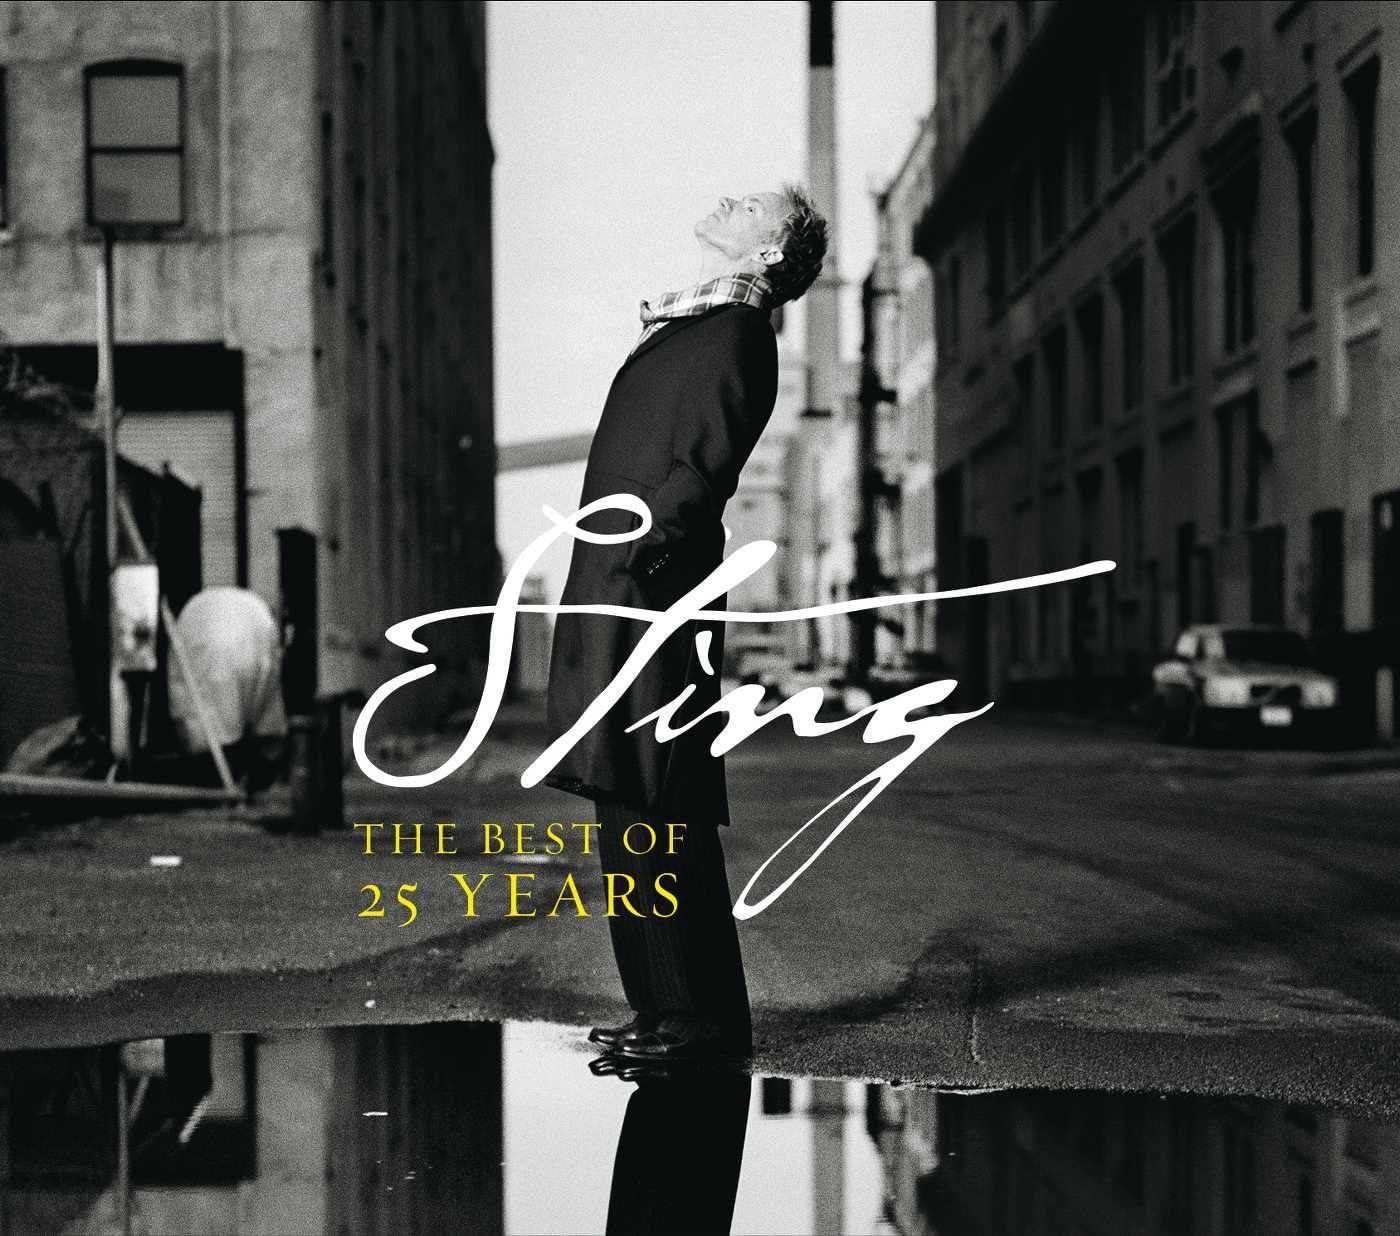 Amazon.co.jp: 25 Years-Box Set (3 CD/DVD): 音楽